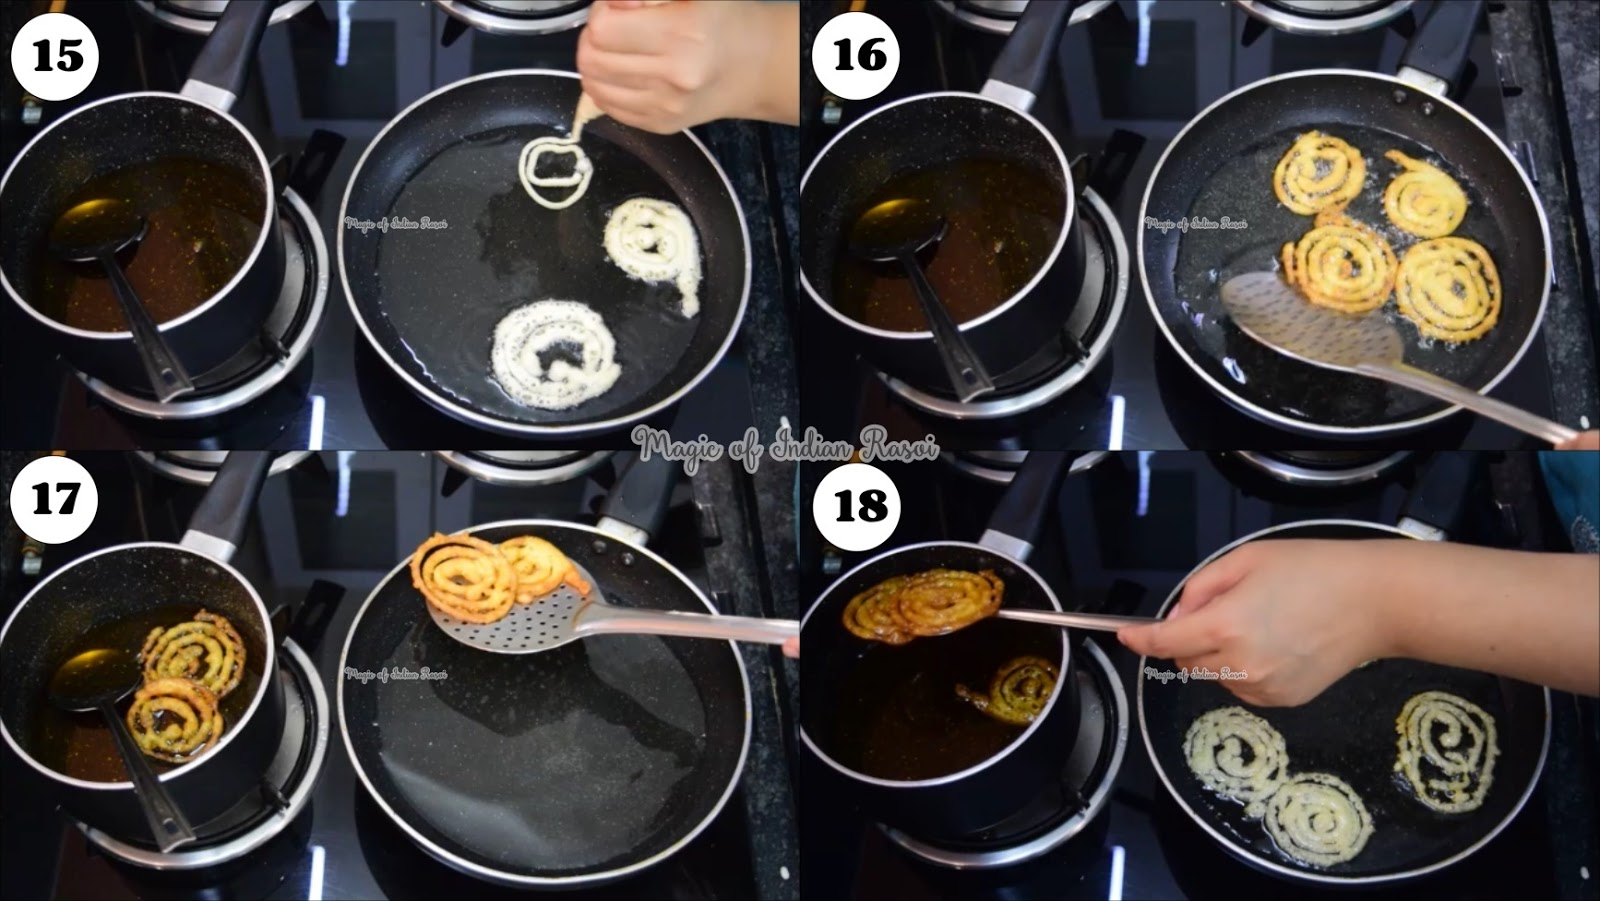 Instant Jalebi (No Yeast No Hydro) Recipe - इंस्टेंट जलेबी - बिना यीस्ट या हाइड्रो के रेसिपी - Priya R - Magic of Indian Rasoi